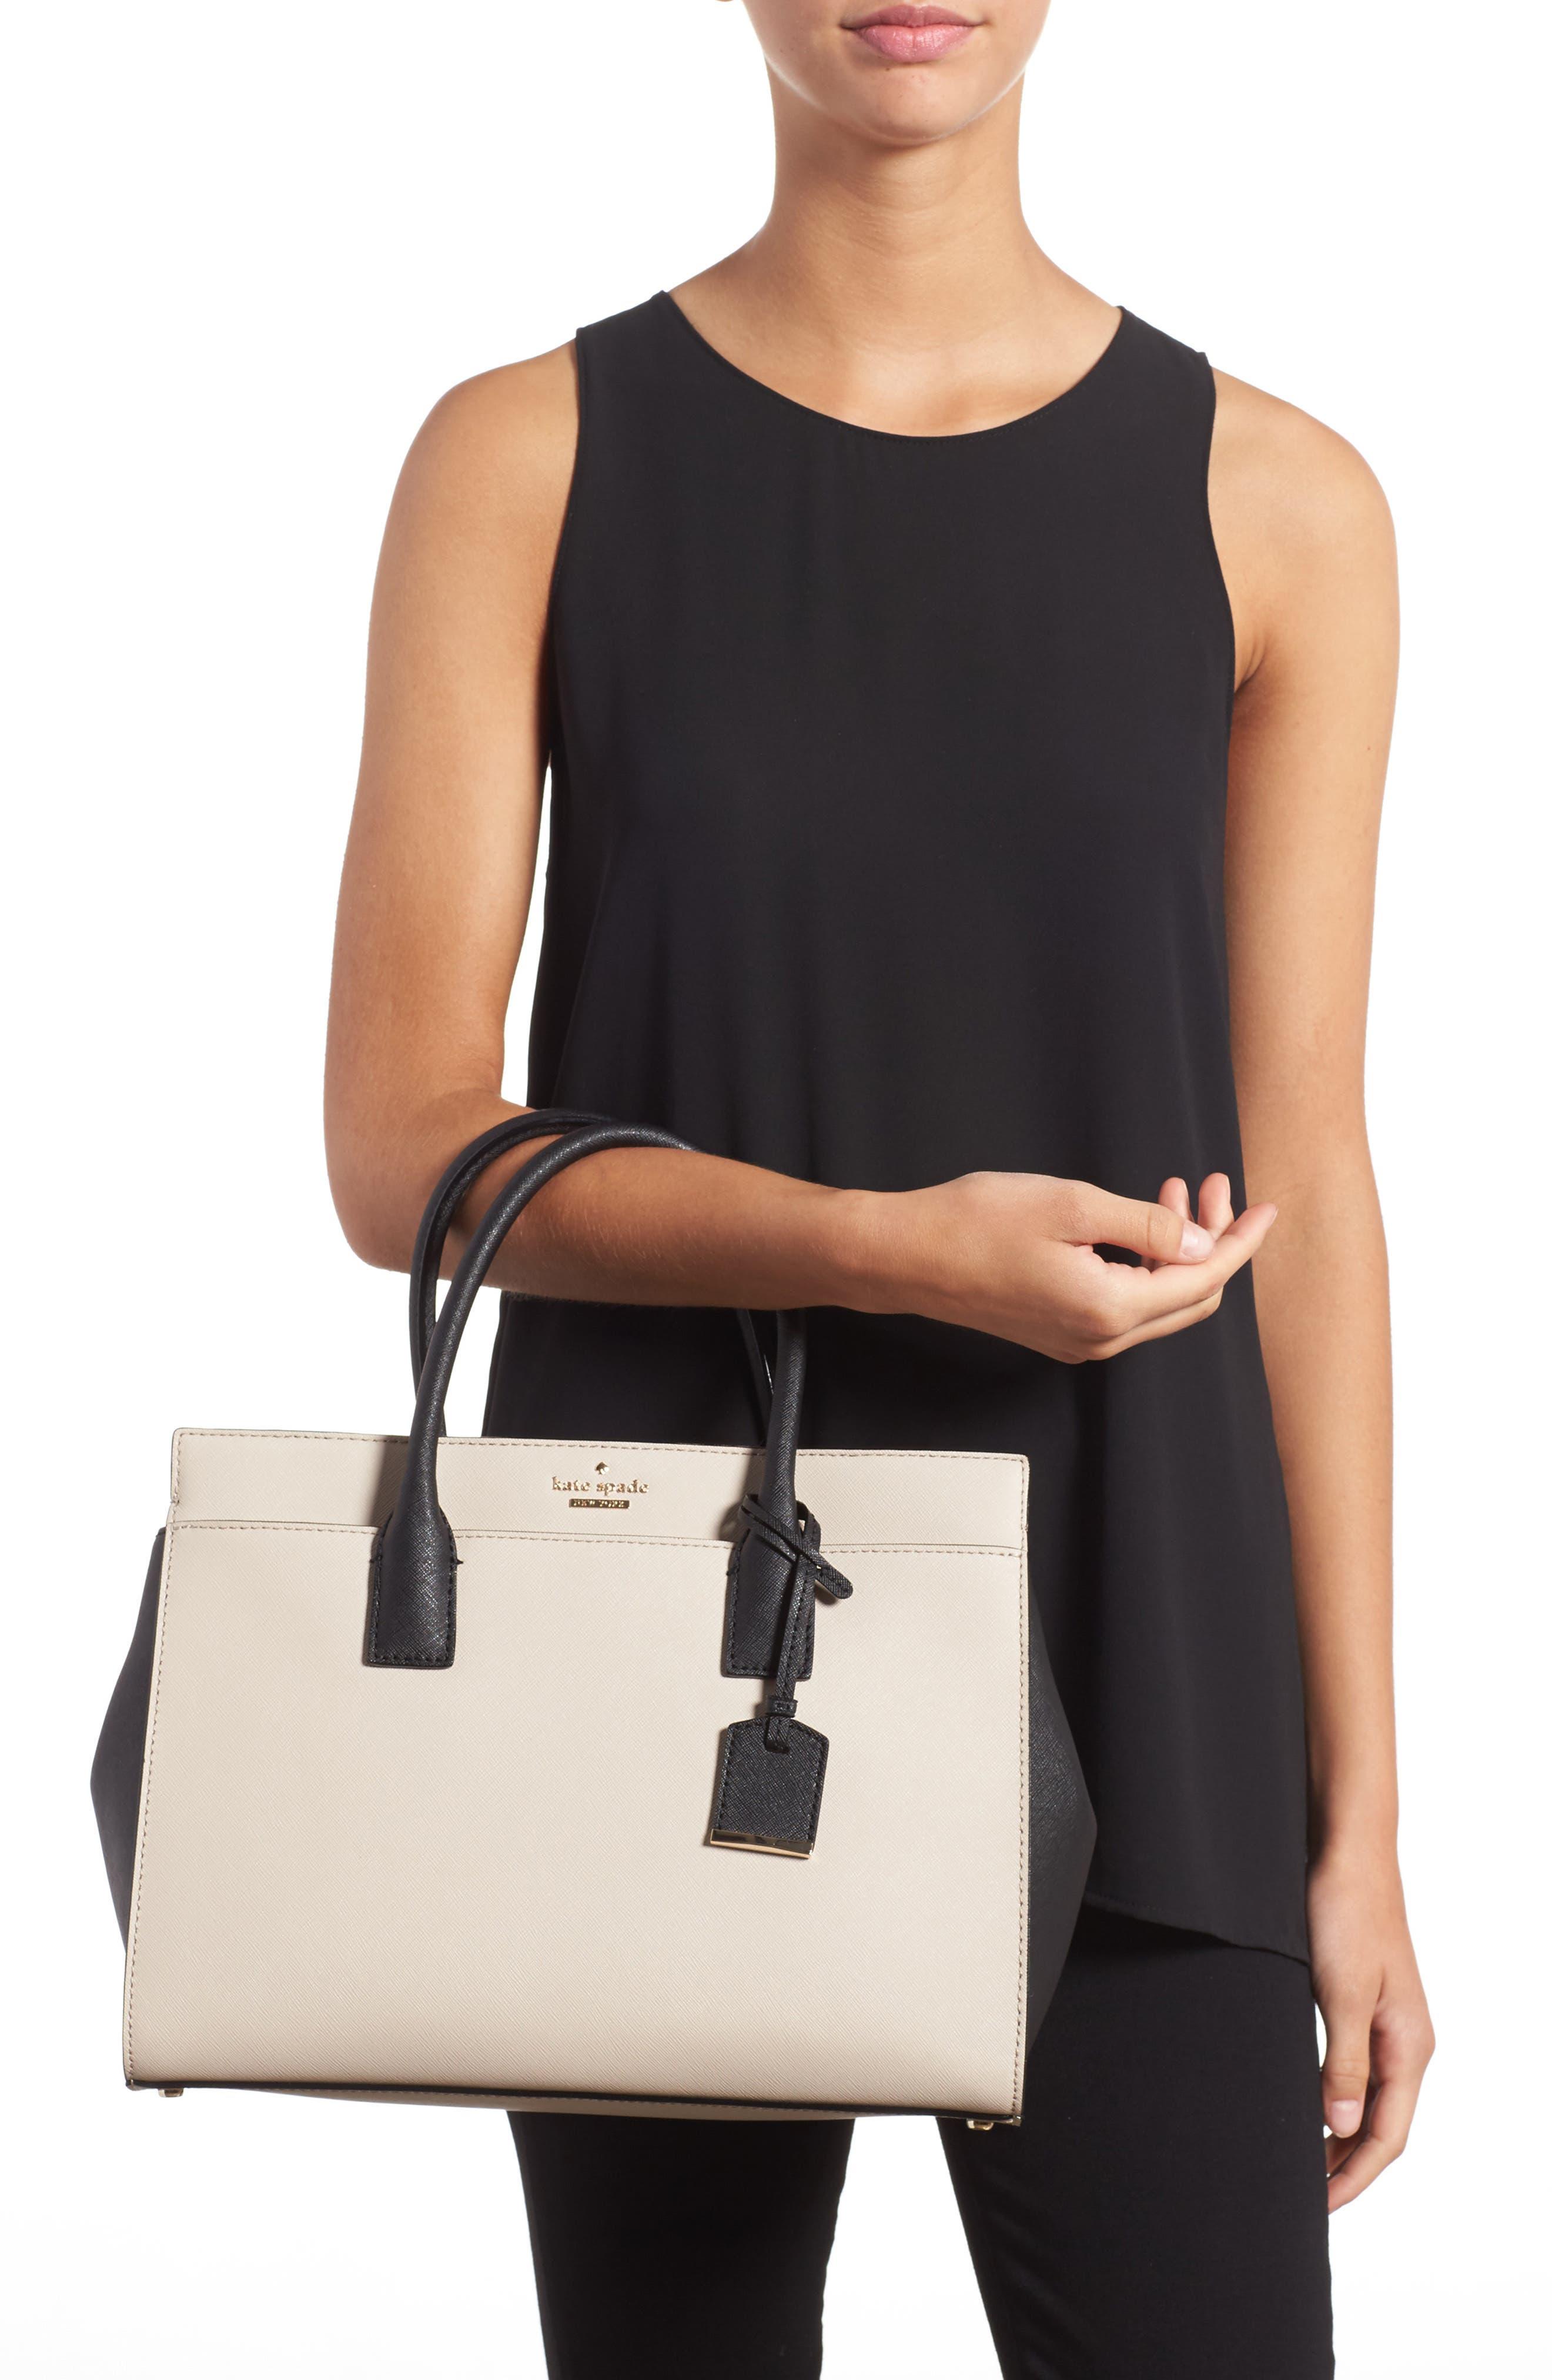 cameron street - candace leather satchel,                             Alternate thumbnail 2, color,                             Tusk/ Black